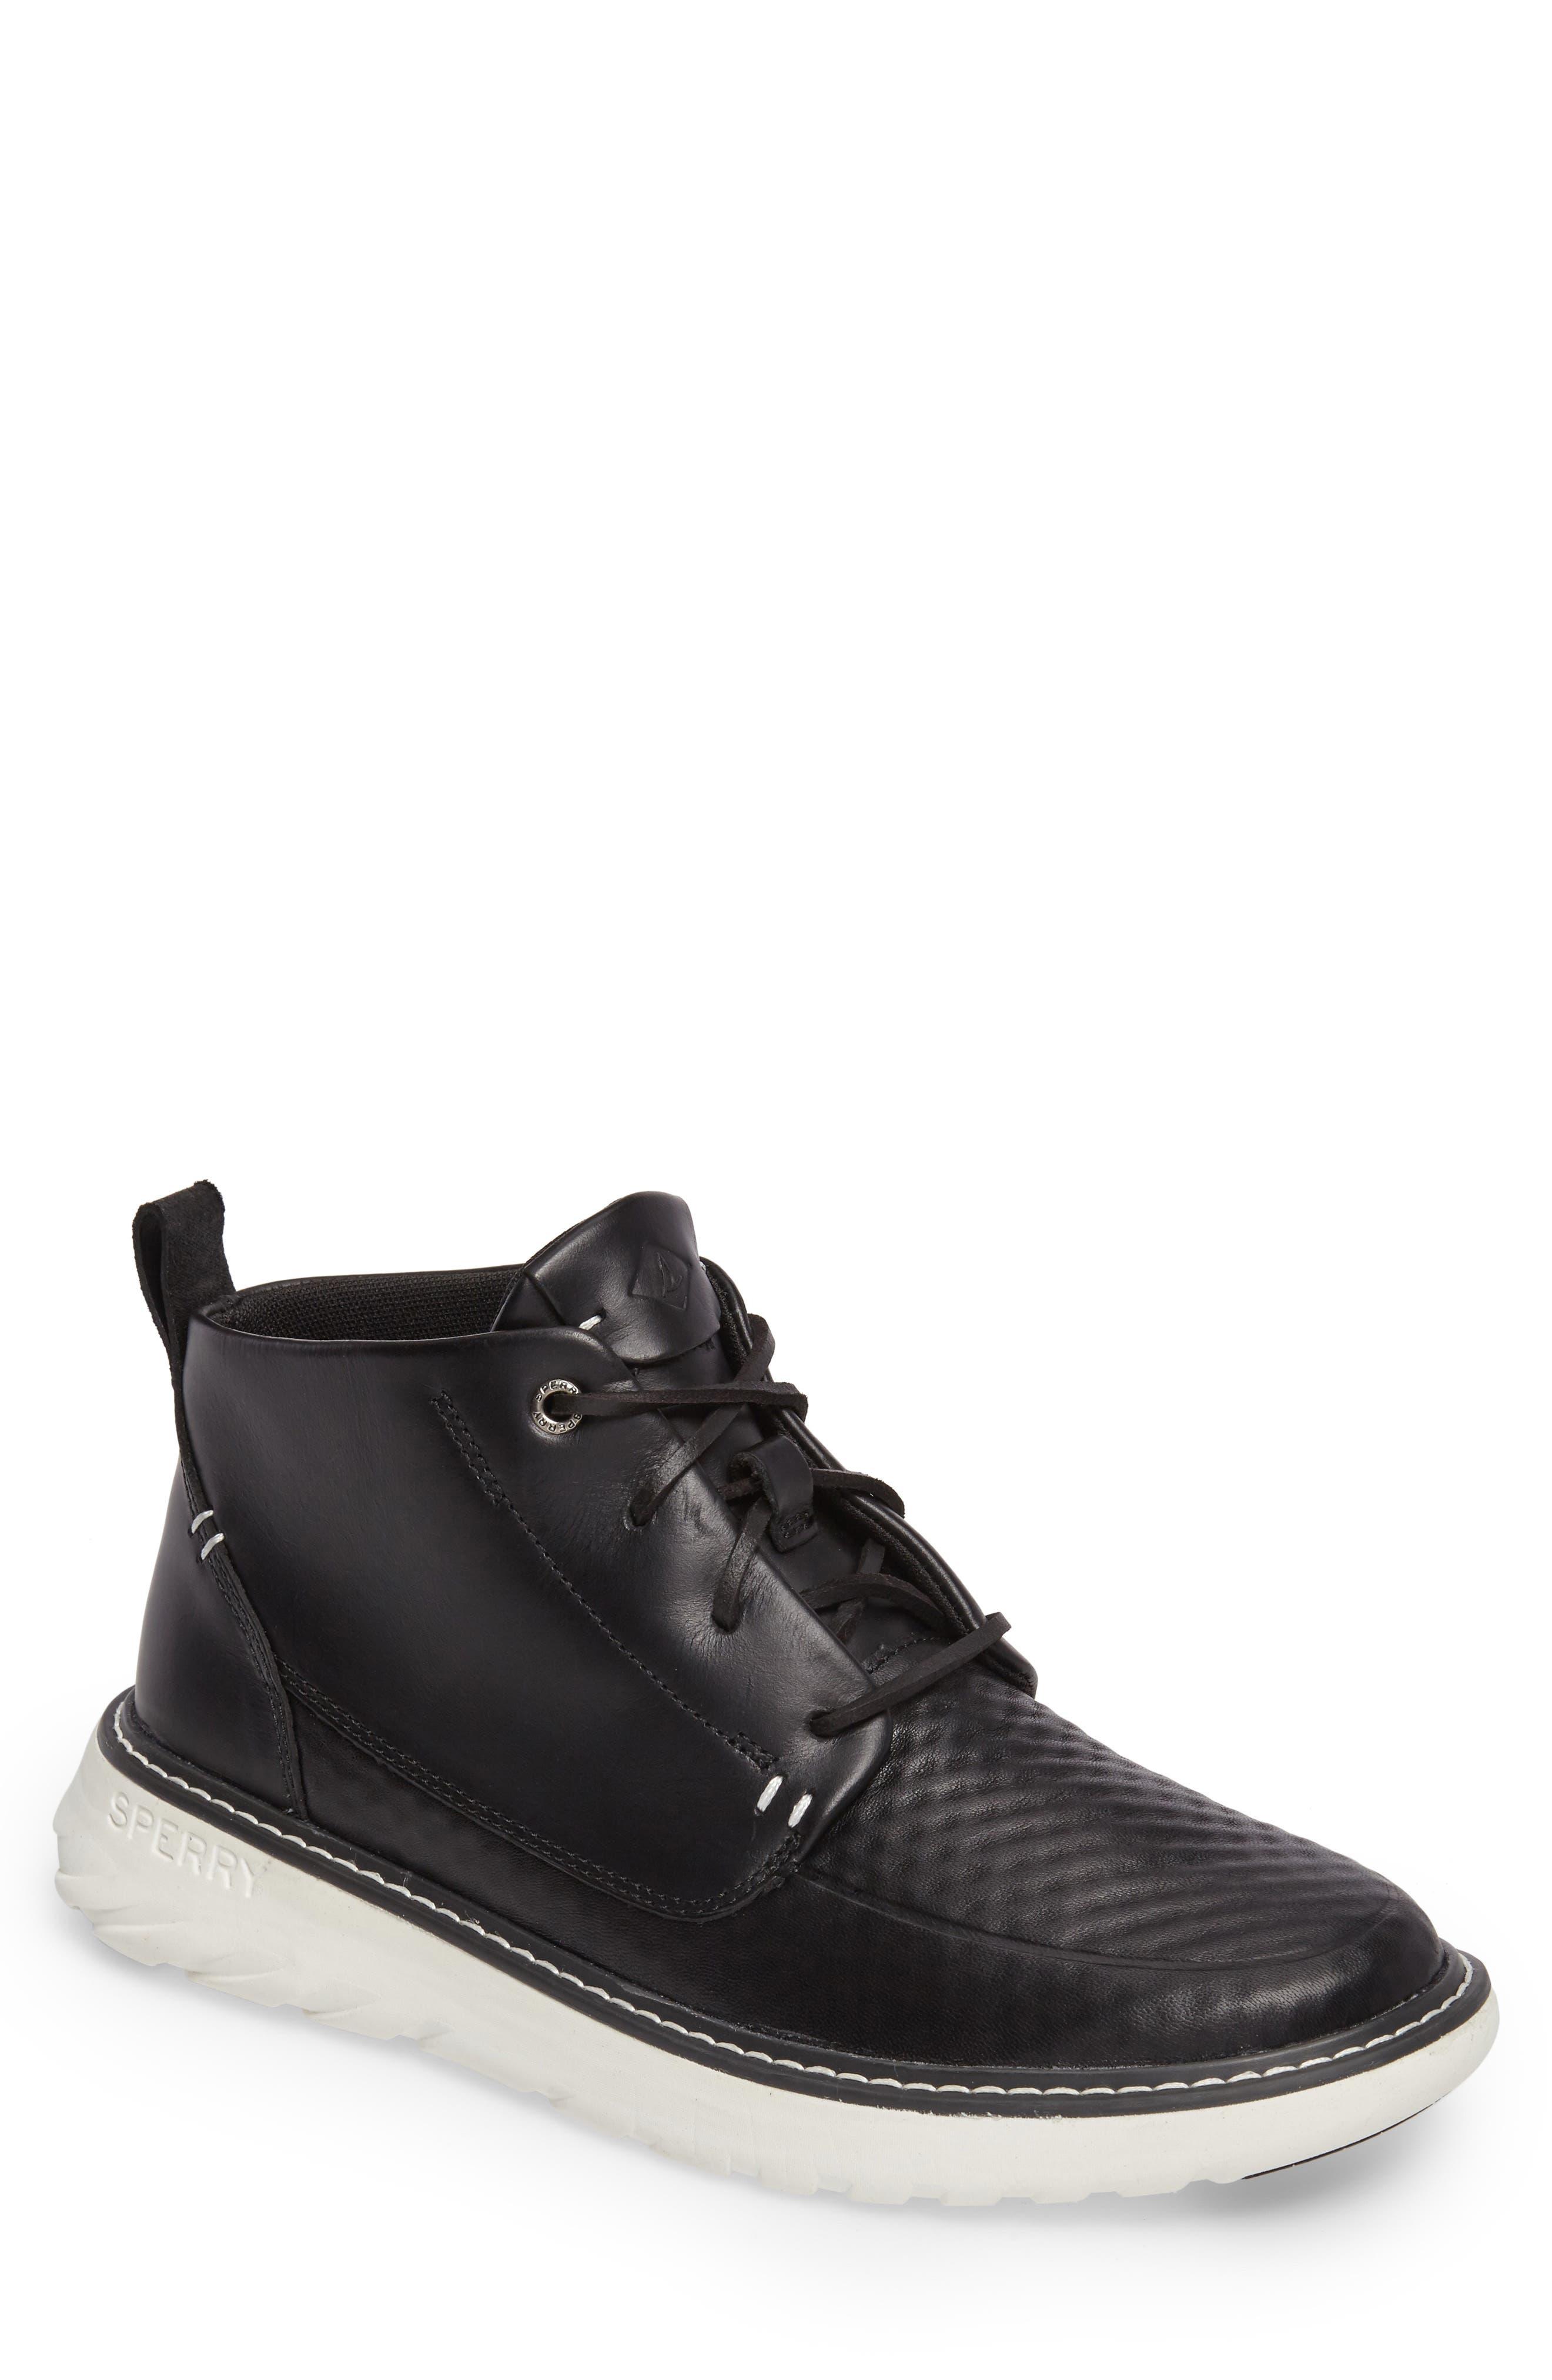 Element Chukka Boot,                             Main thumbnail 1, color,                             Black Leather